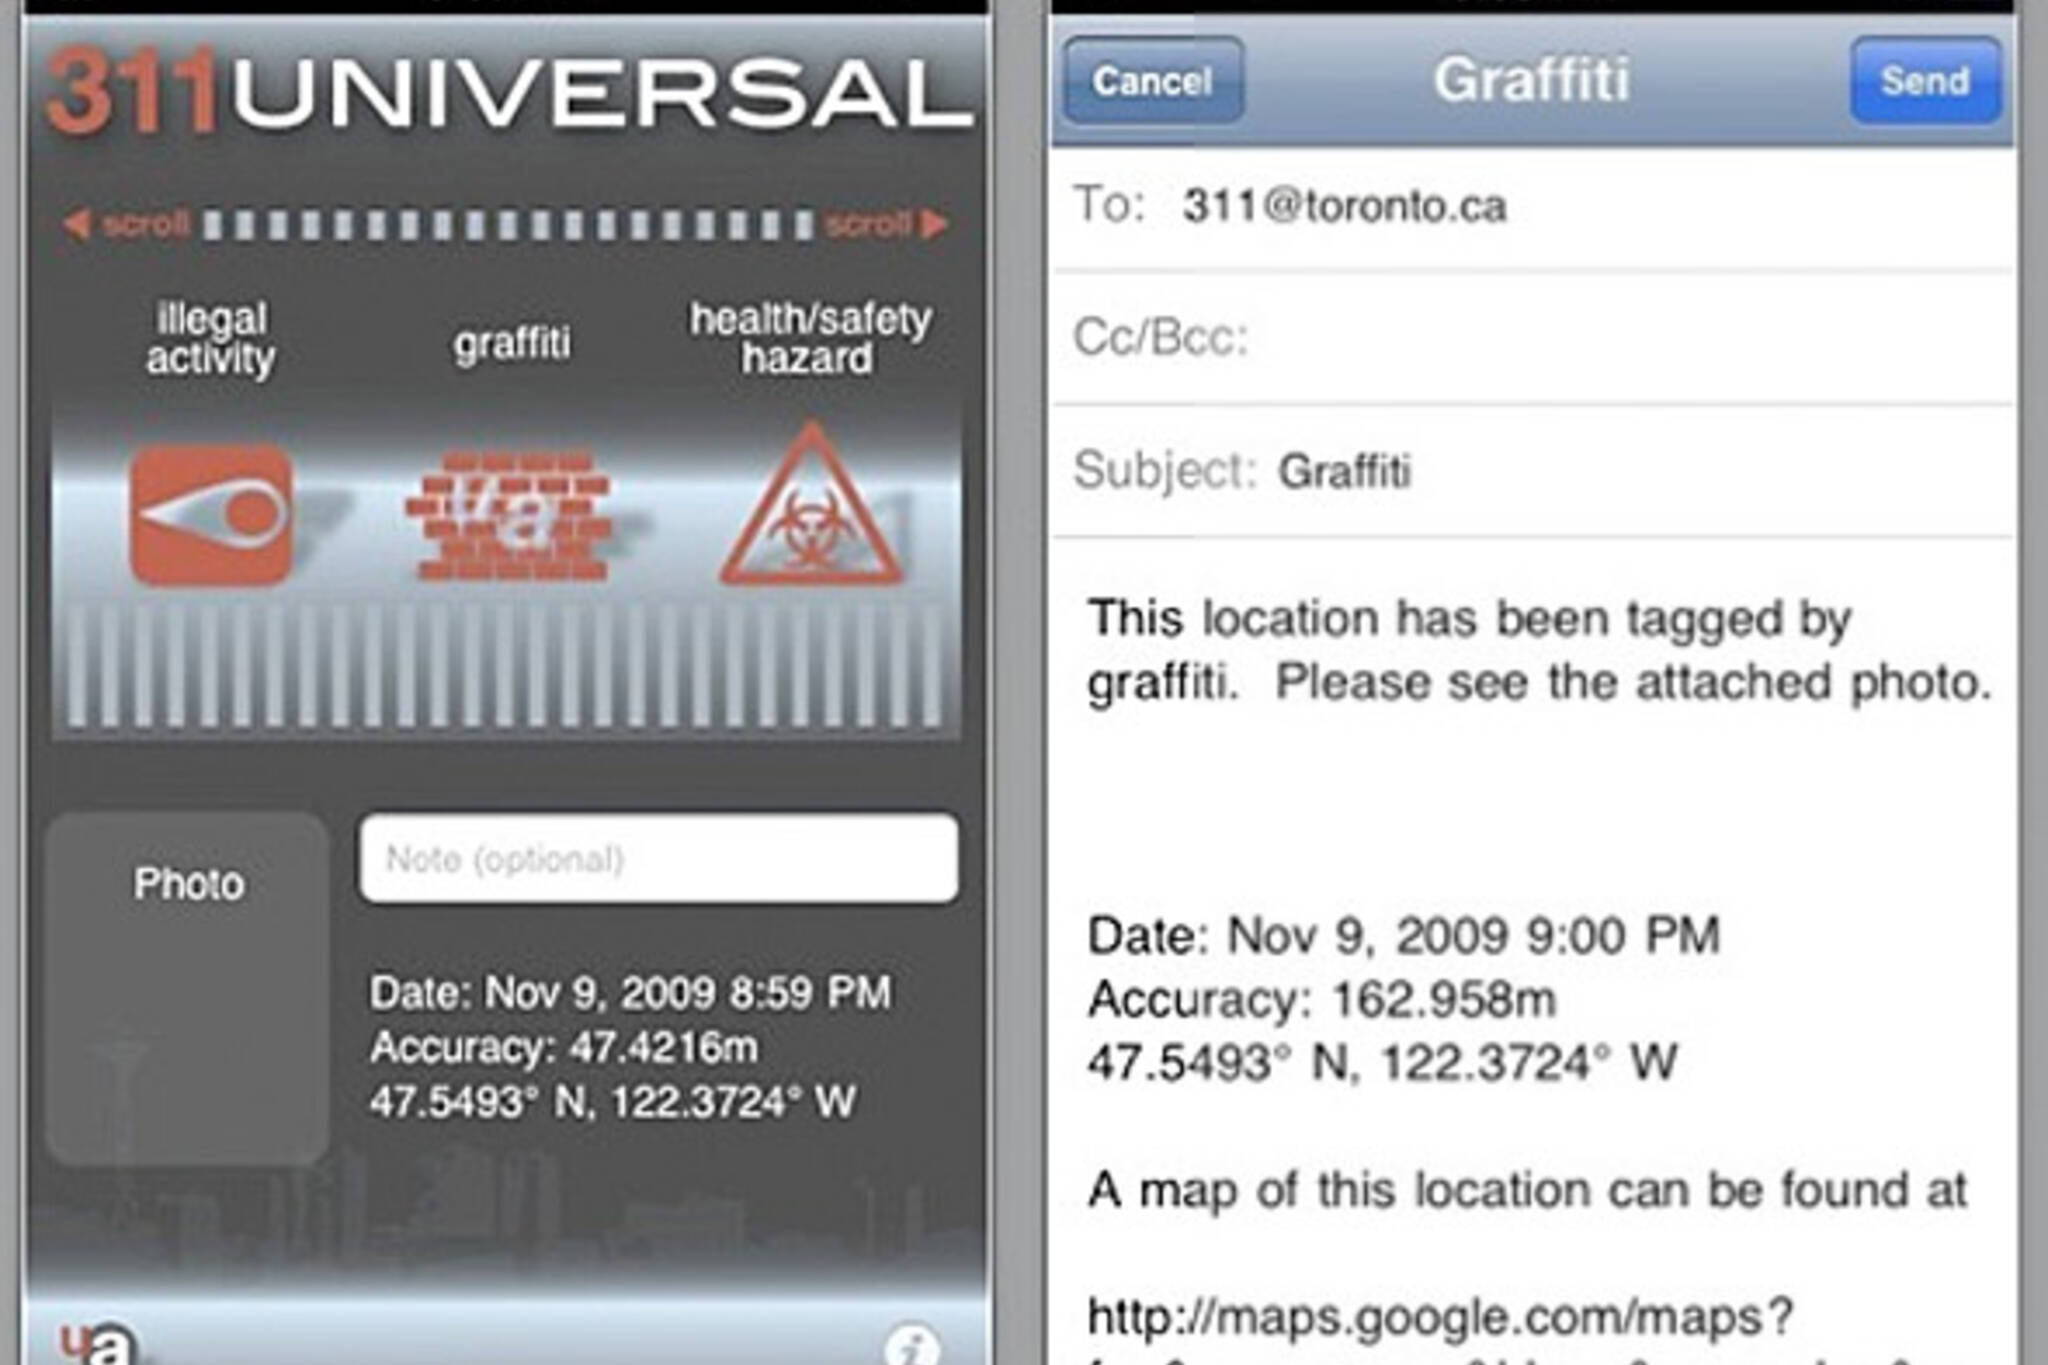 311 universal iphone app toronto